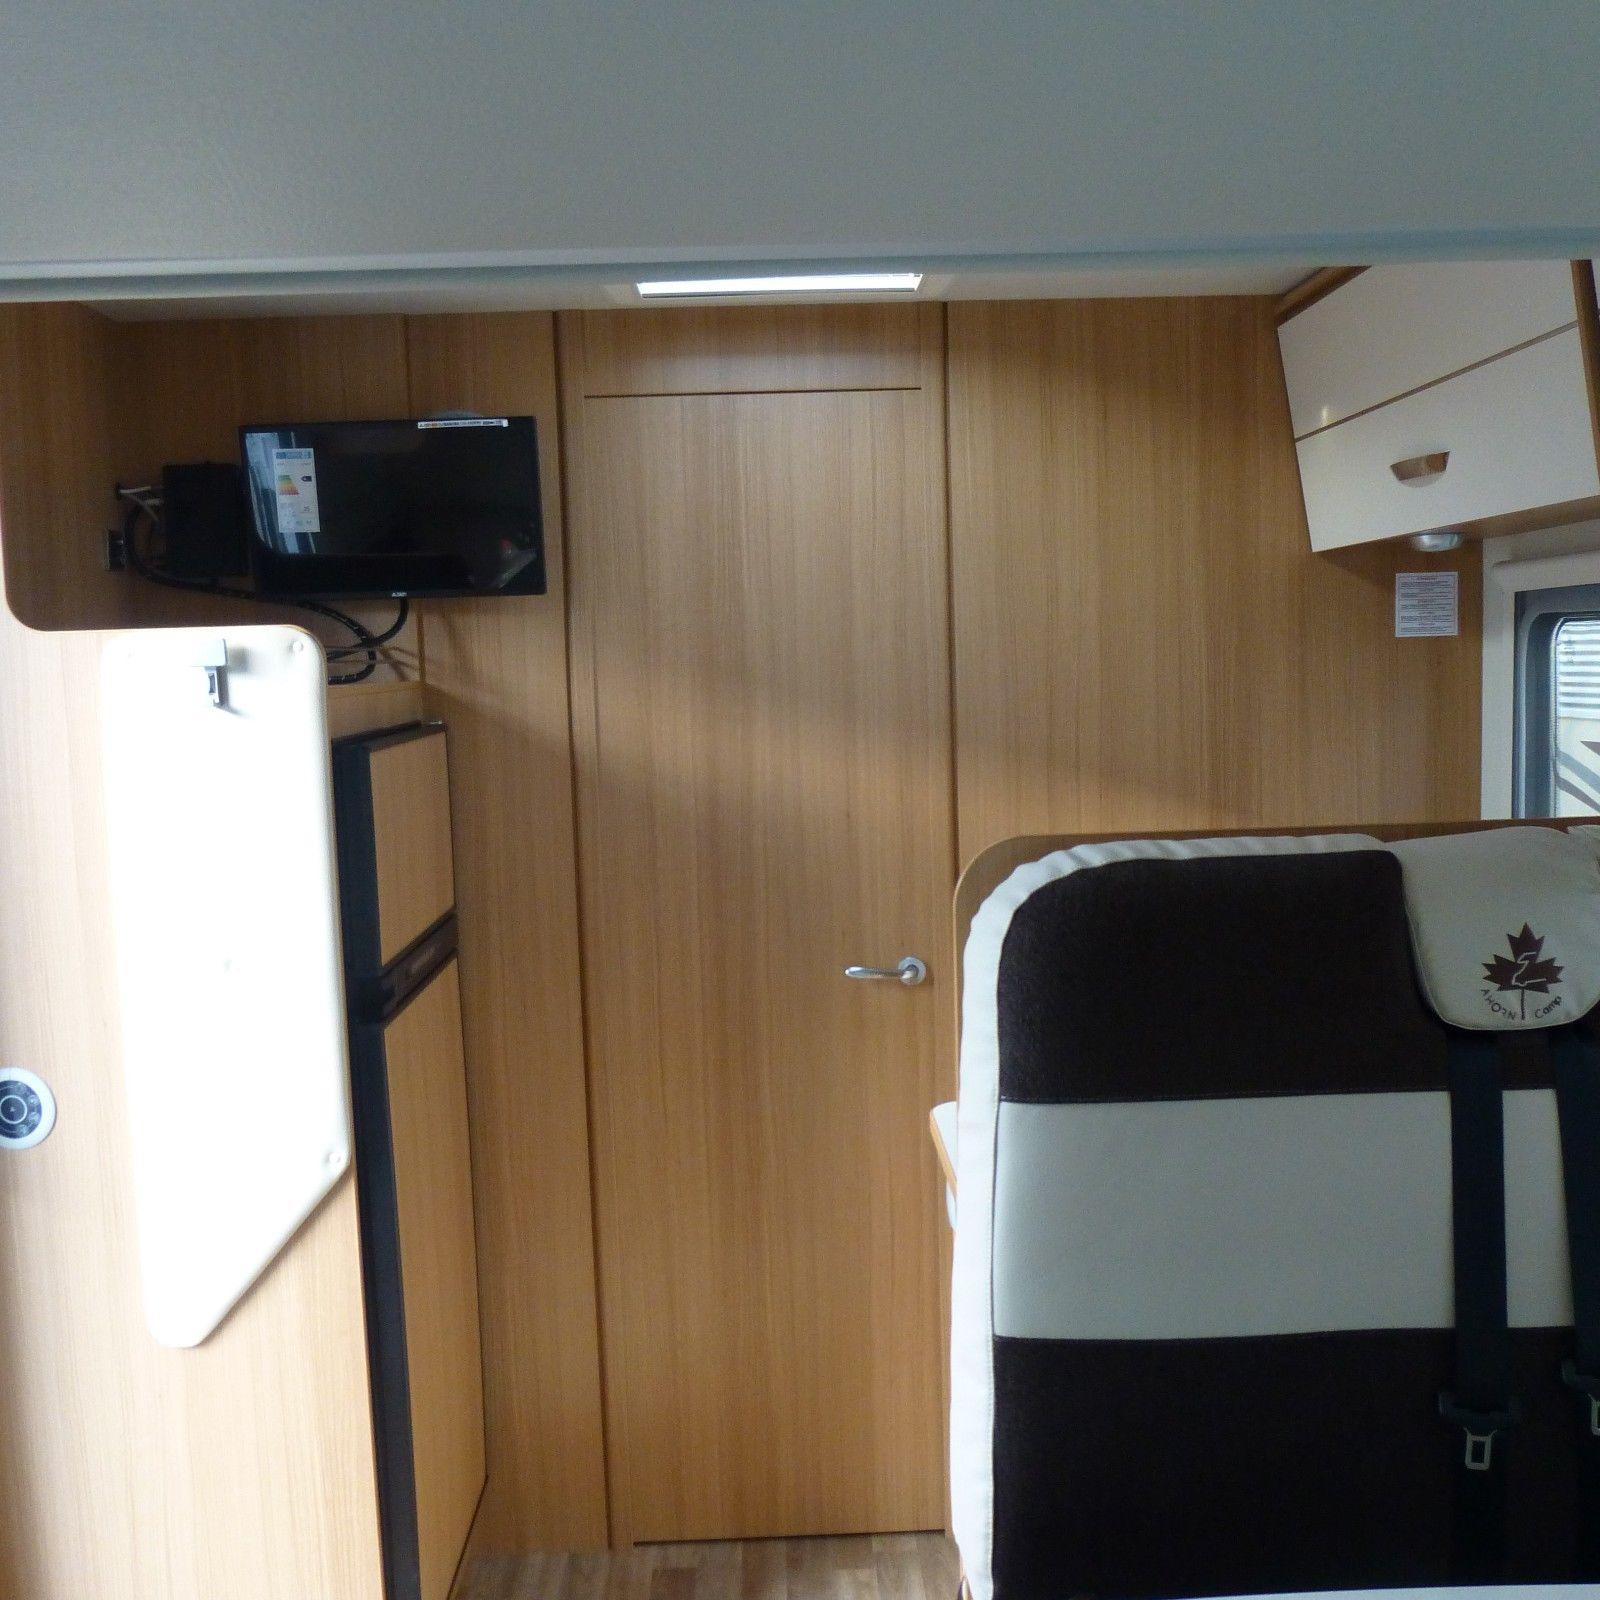 renault ahorn canada ae euro 6b 130 ps wintercamping. Black Bedroom Furniture Sets. Home Design Ideas